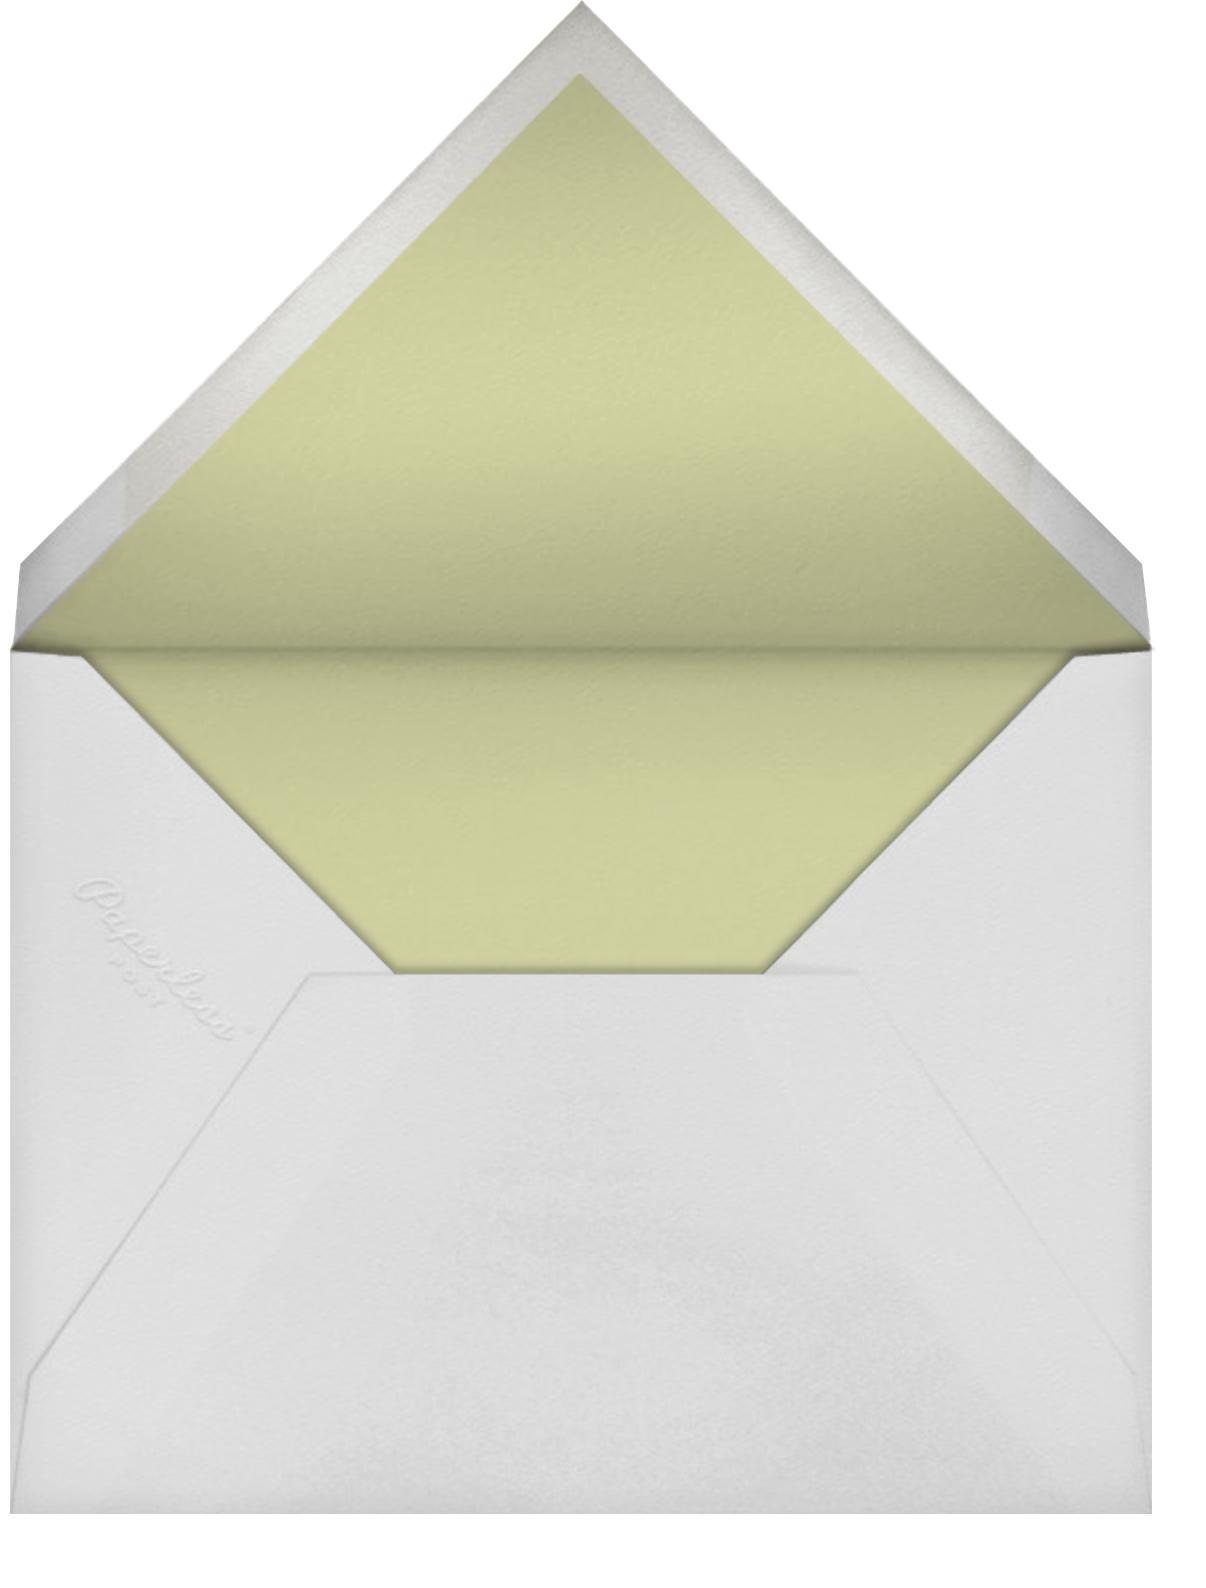 Saranac - Celery and Black - Crane & Co. - null - envelope back